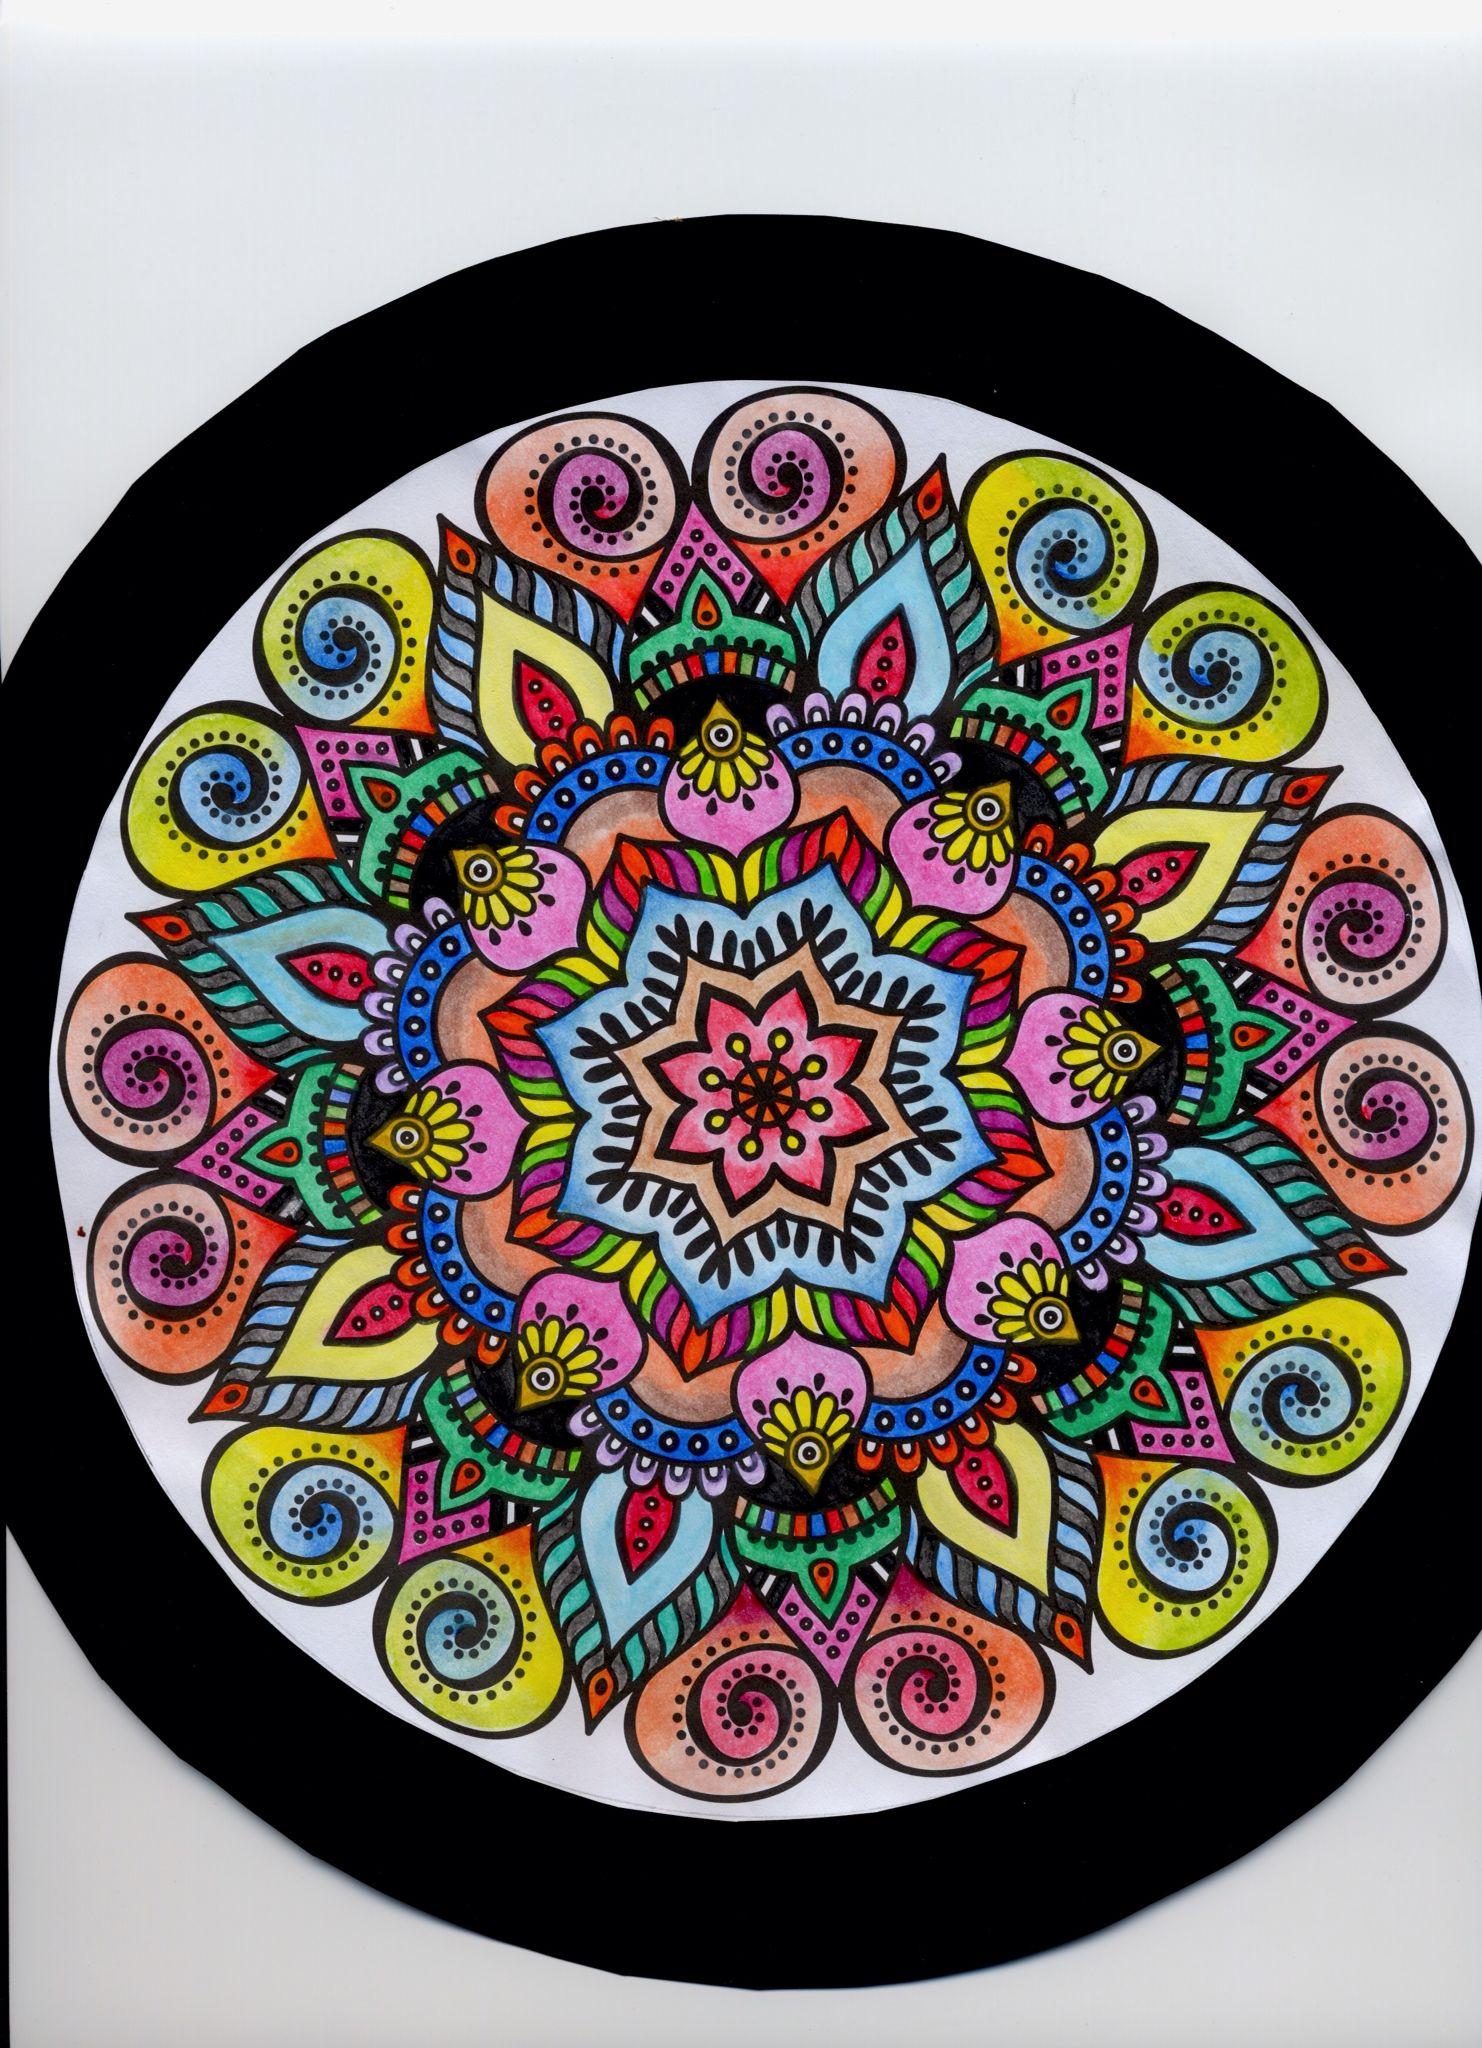 Mandala In Aquarelles From The Art Therapy Colouring Book From Aldi Art Therapy Coloring Book Journal Inspiration Diy Art